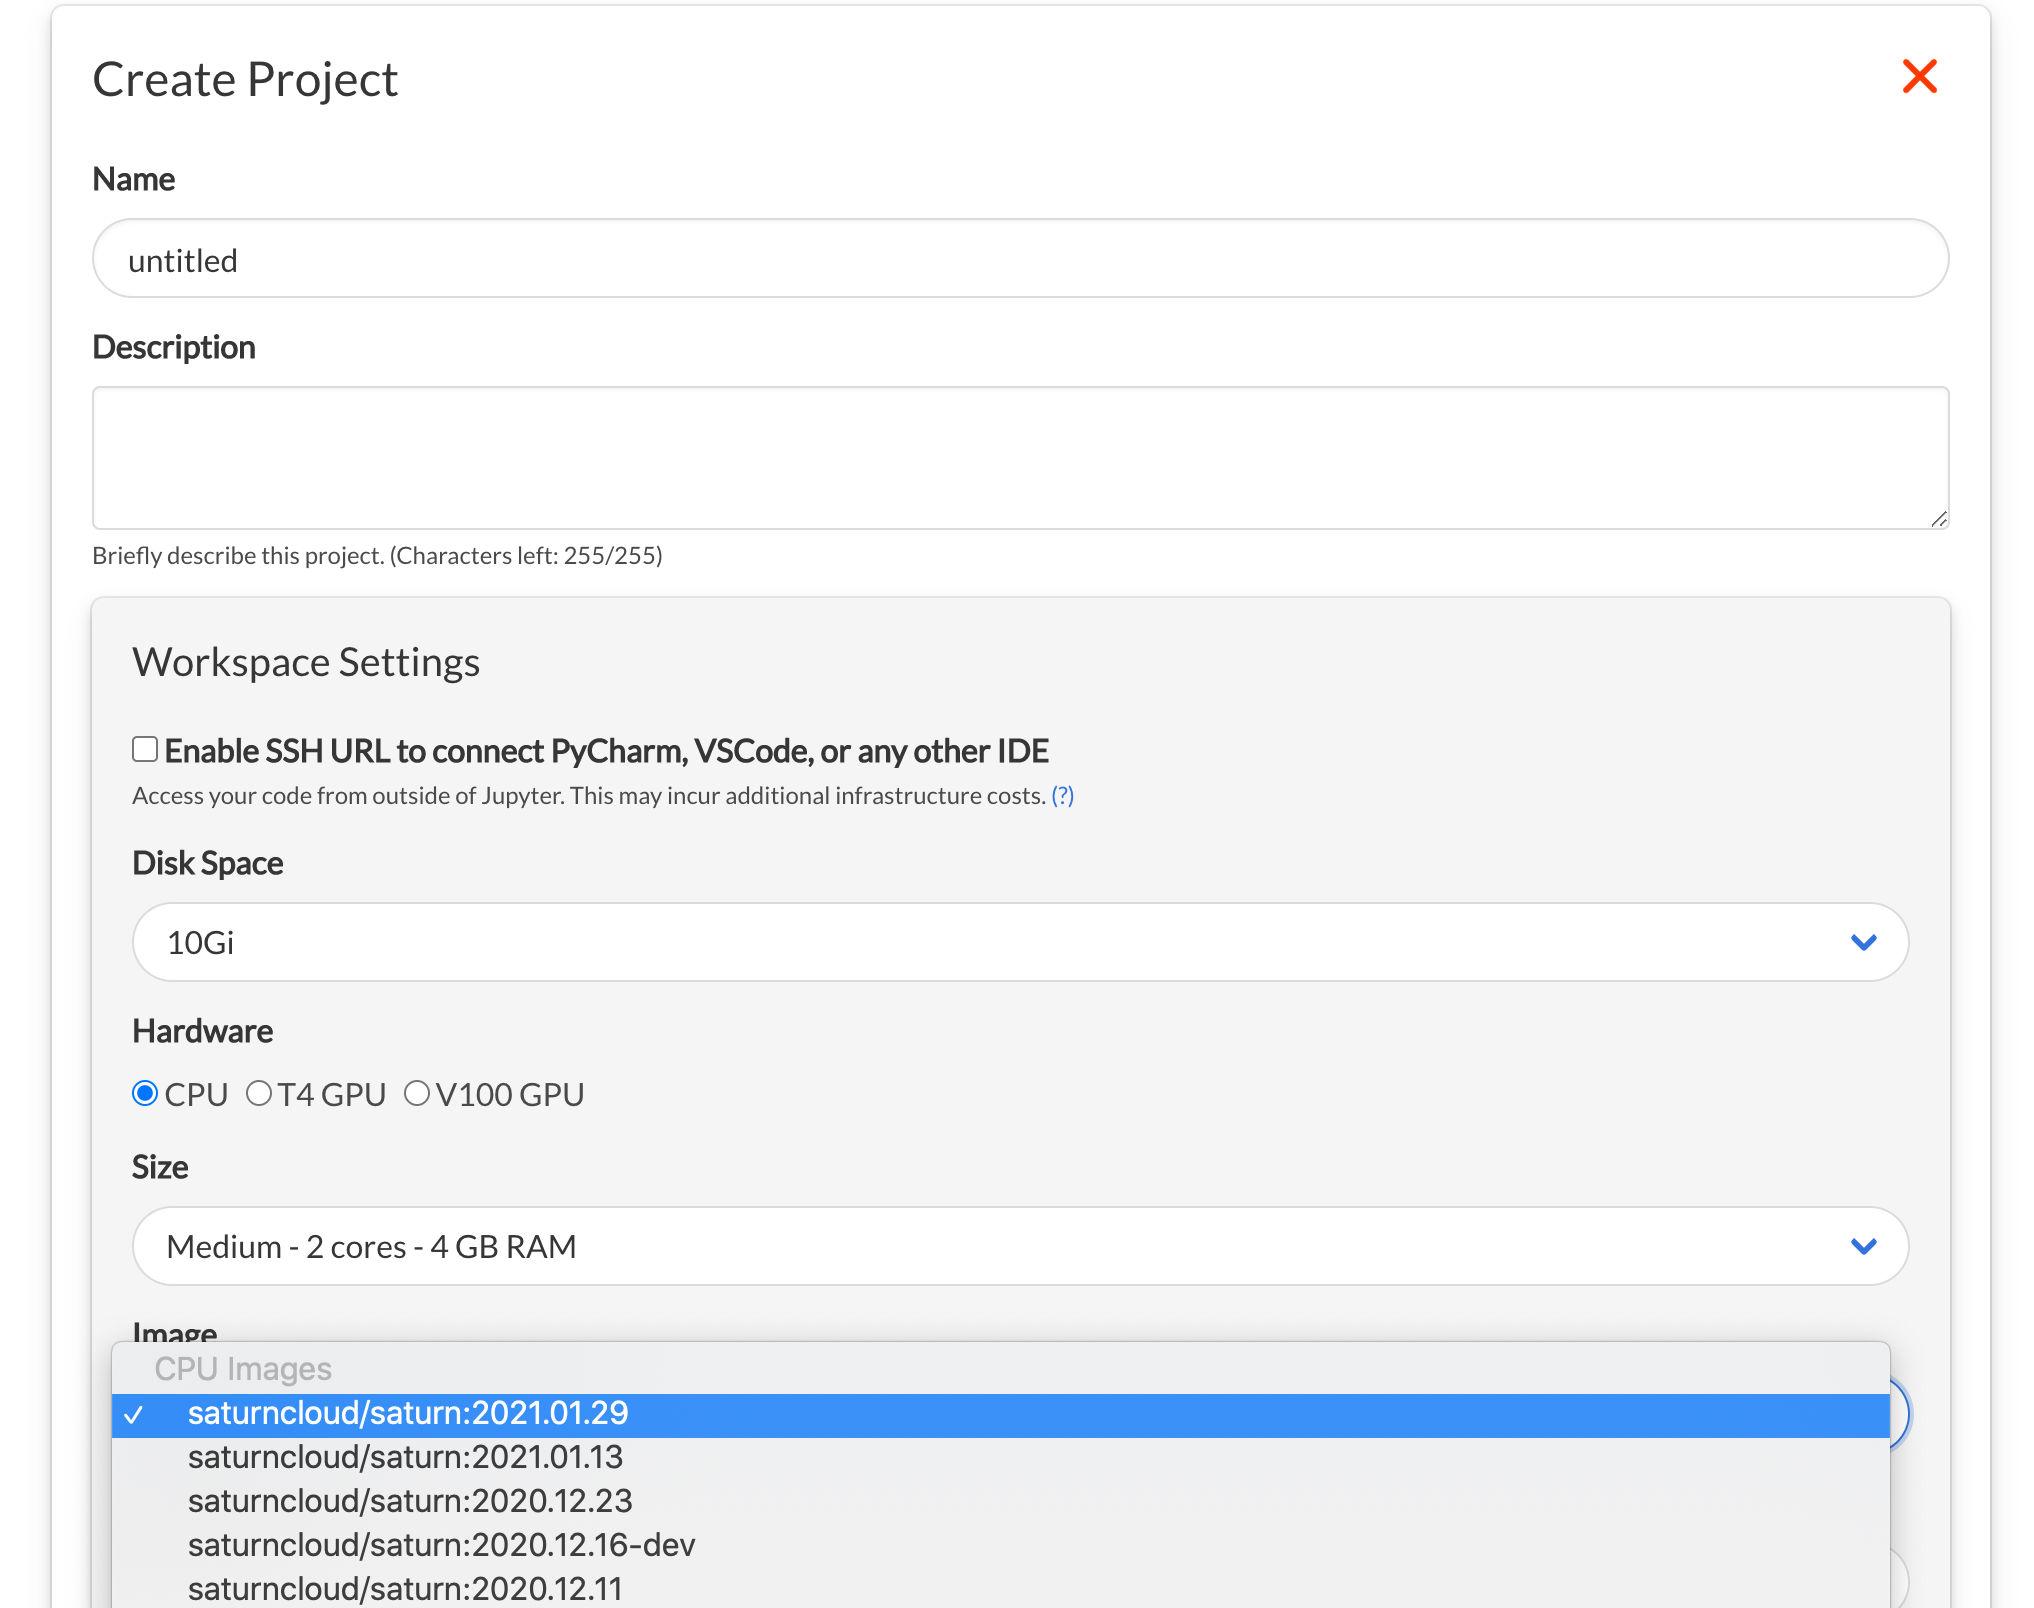 Screenshot of Saturn Cloud Create Project form